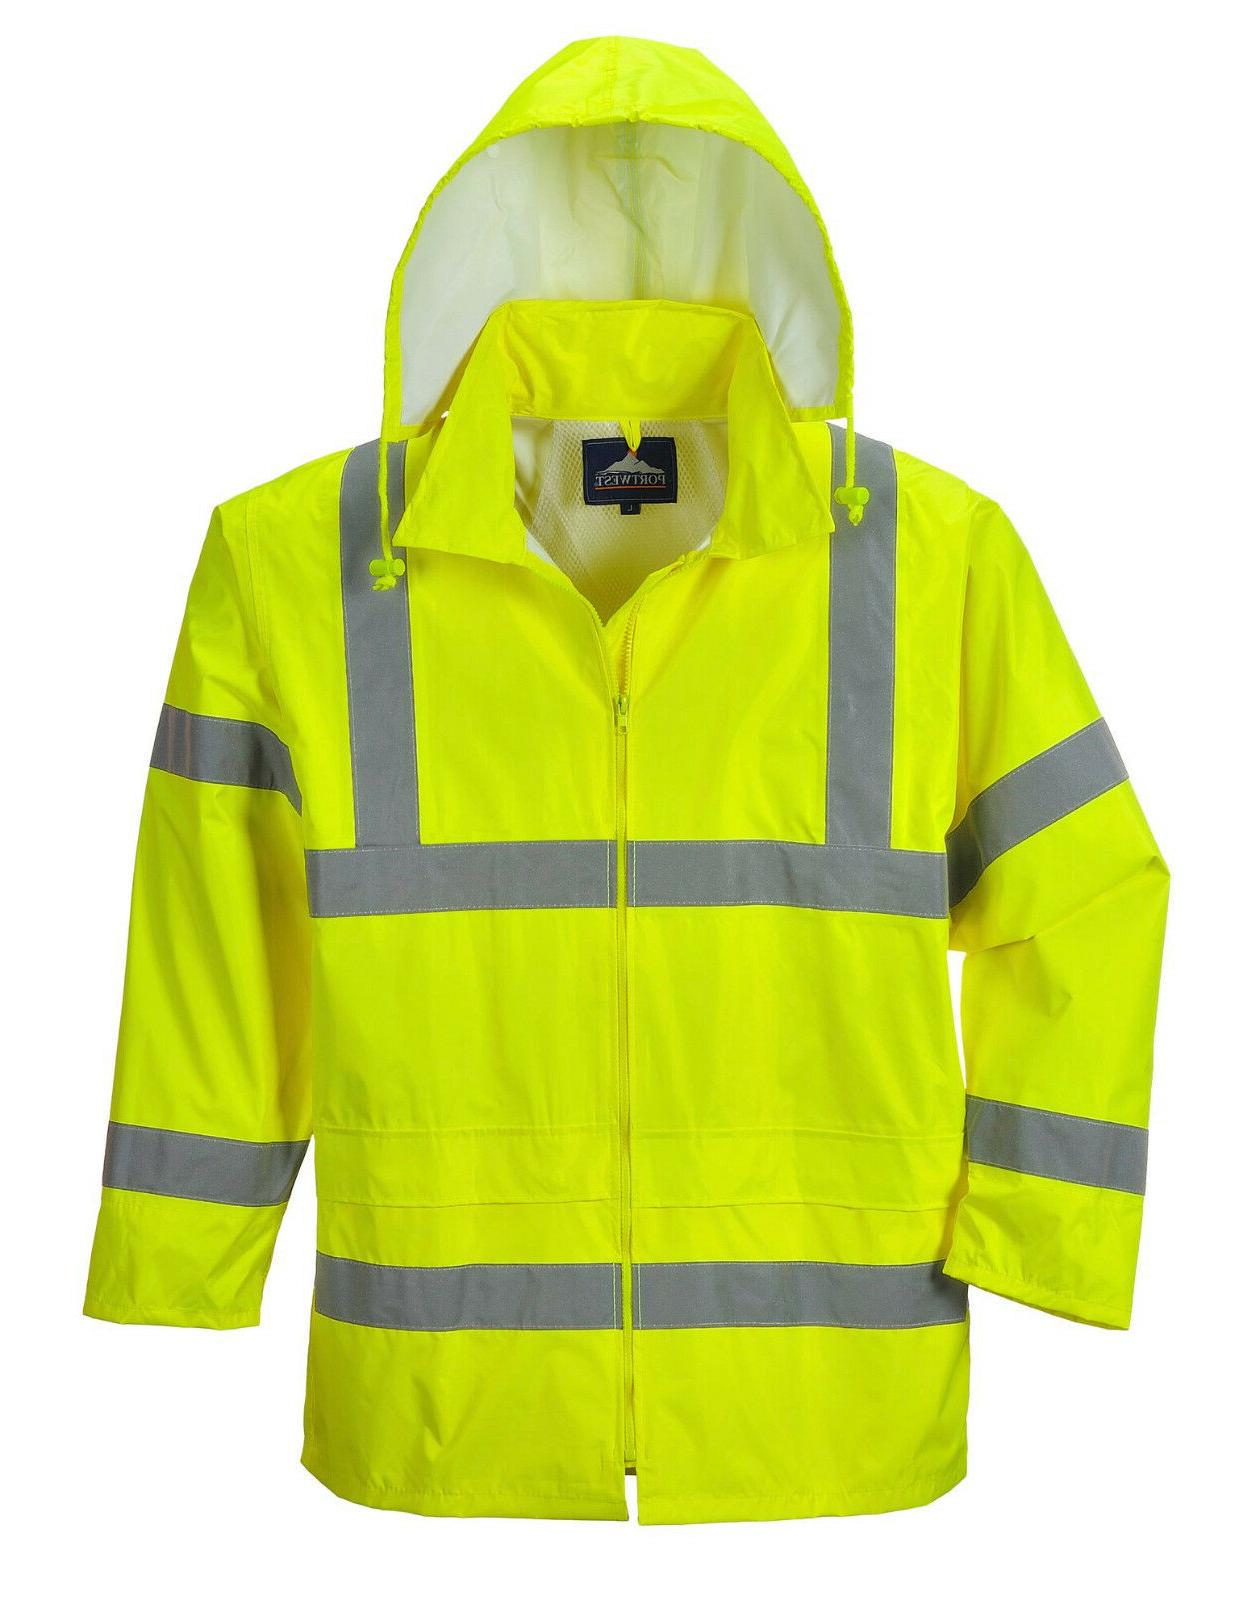 Safety Green Raincoat w